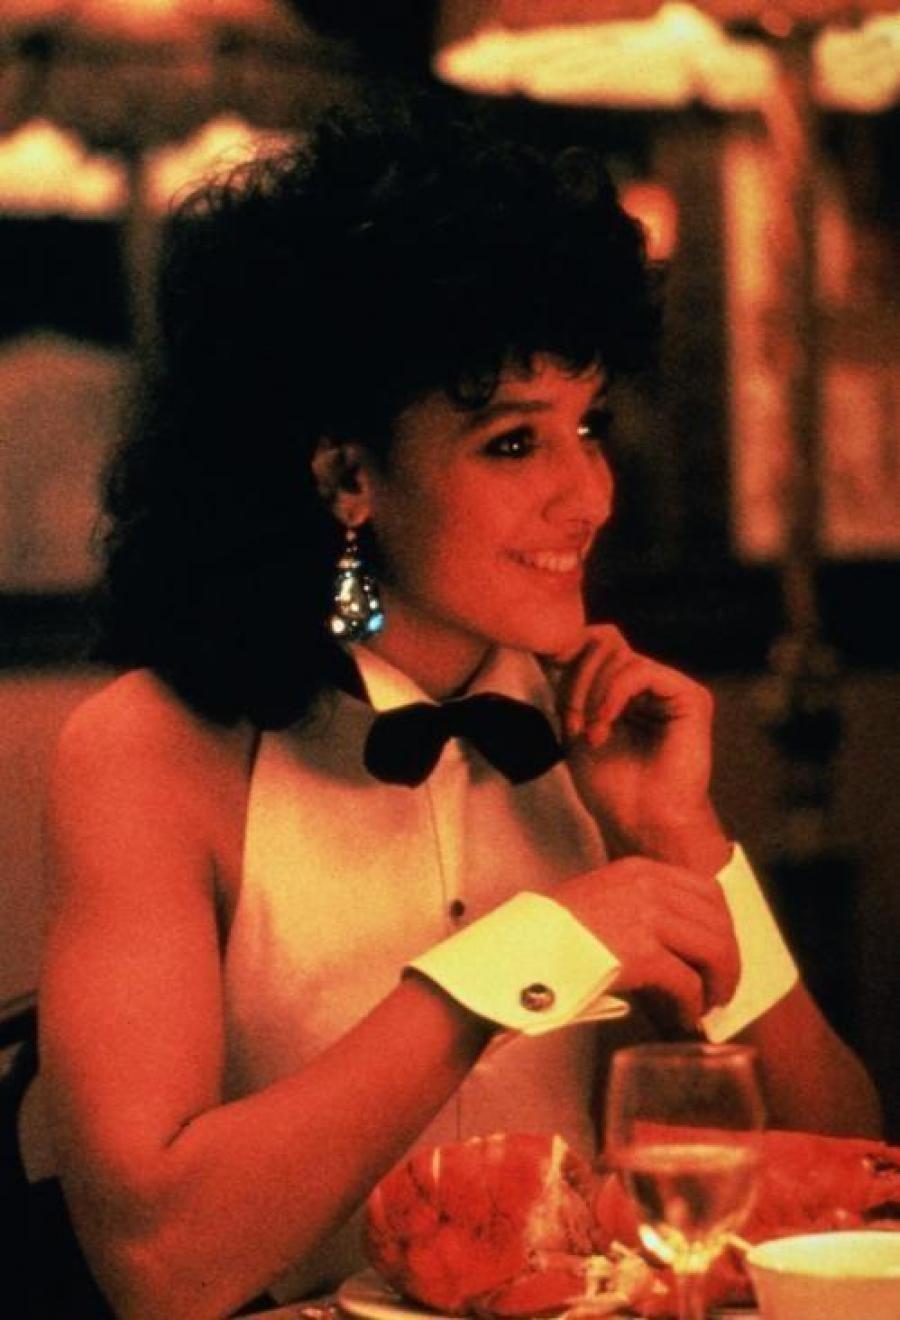 Видео Картинки кадри из фильма танец матылька Жаннка закидывает